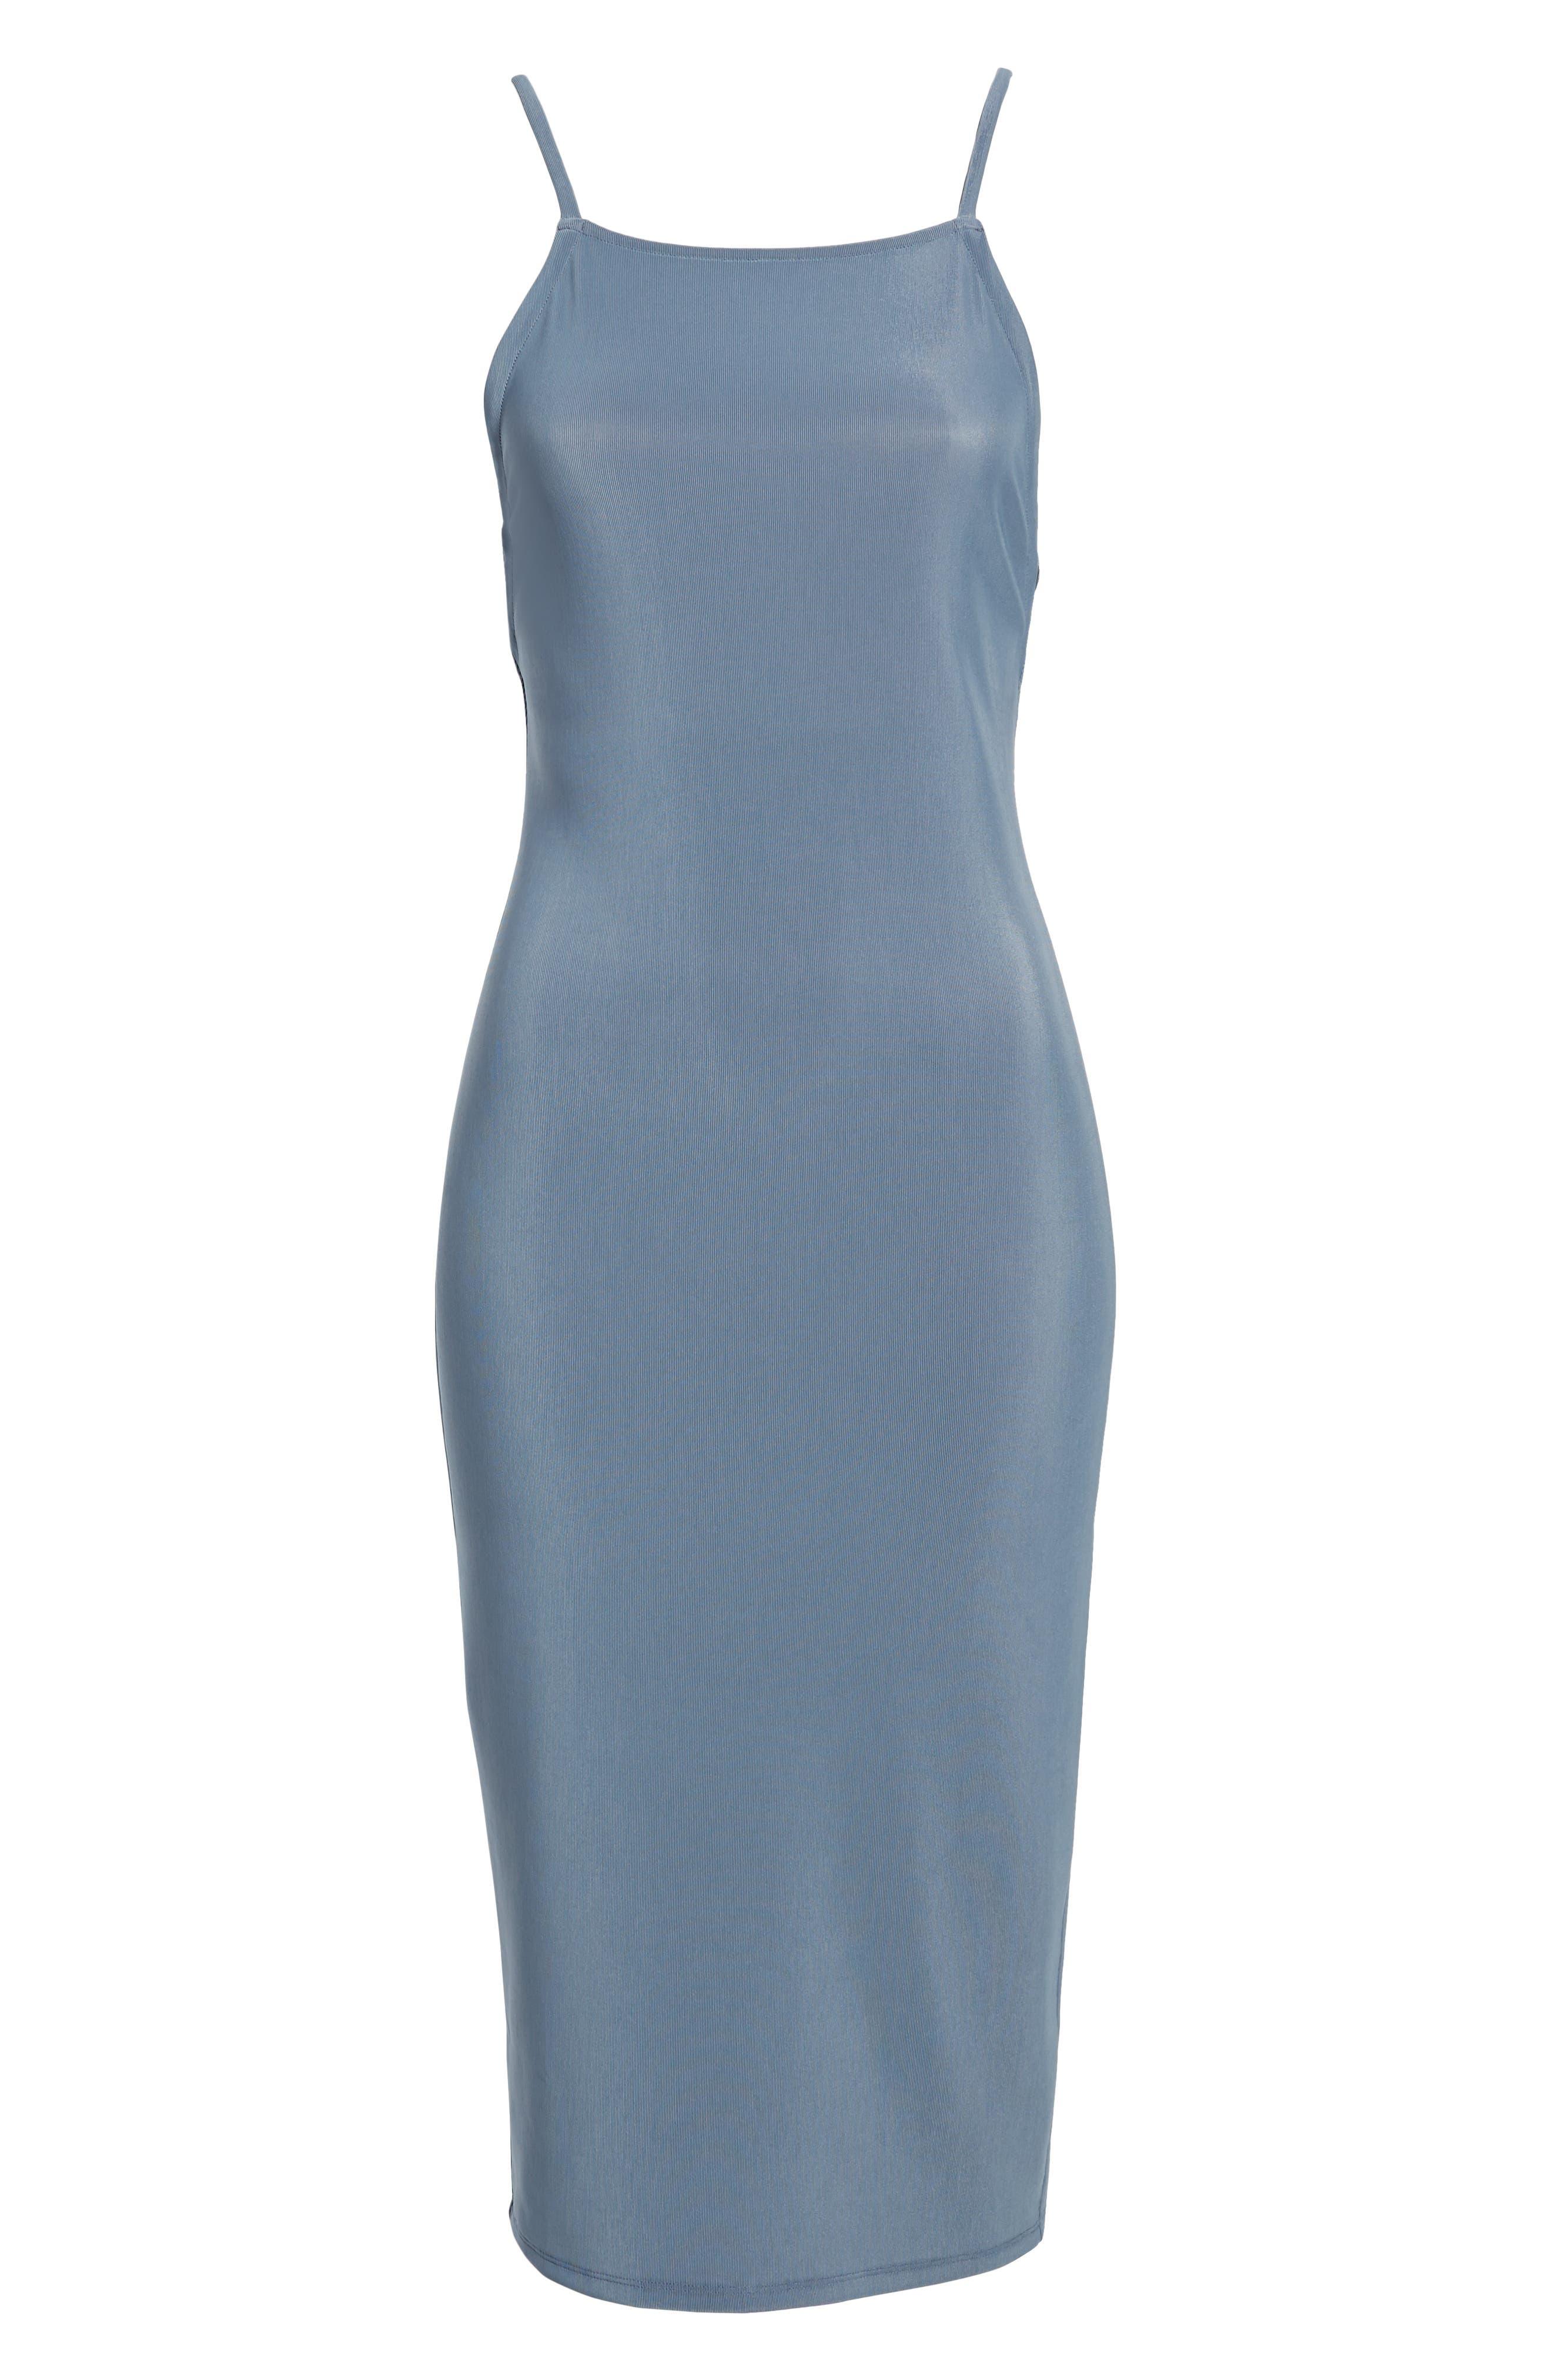 Strappy Bodycon Dress,                             Alternate thumbnail 7, color,                             030